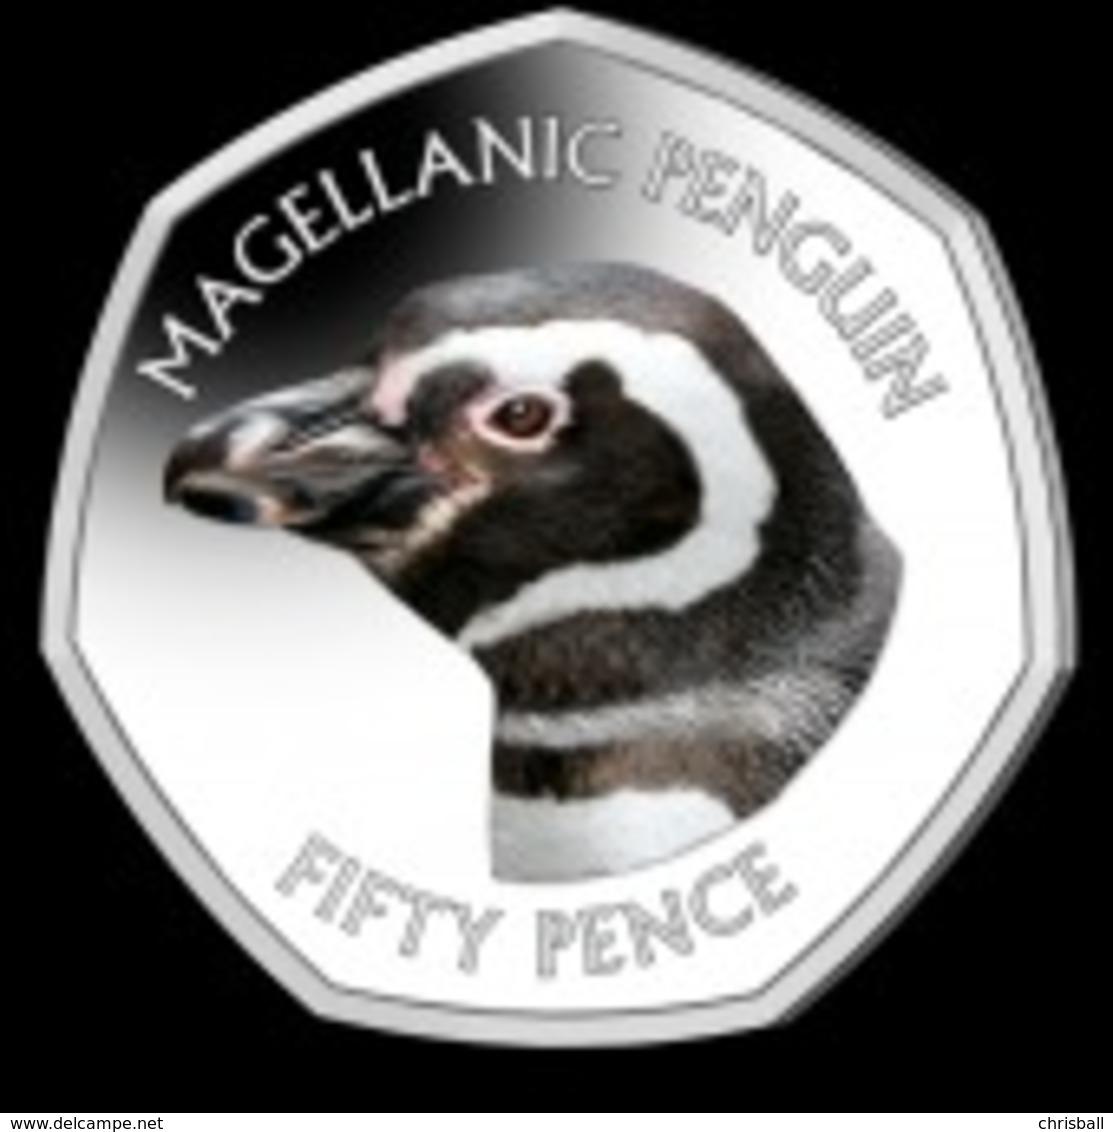 Falkland Islands 50p Coin Magellanic Penguin Diamond Finish Uncirculated - Falkland Islands